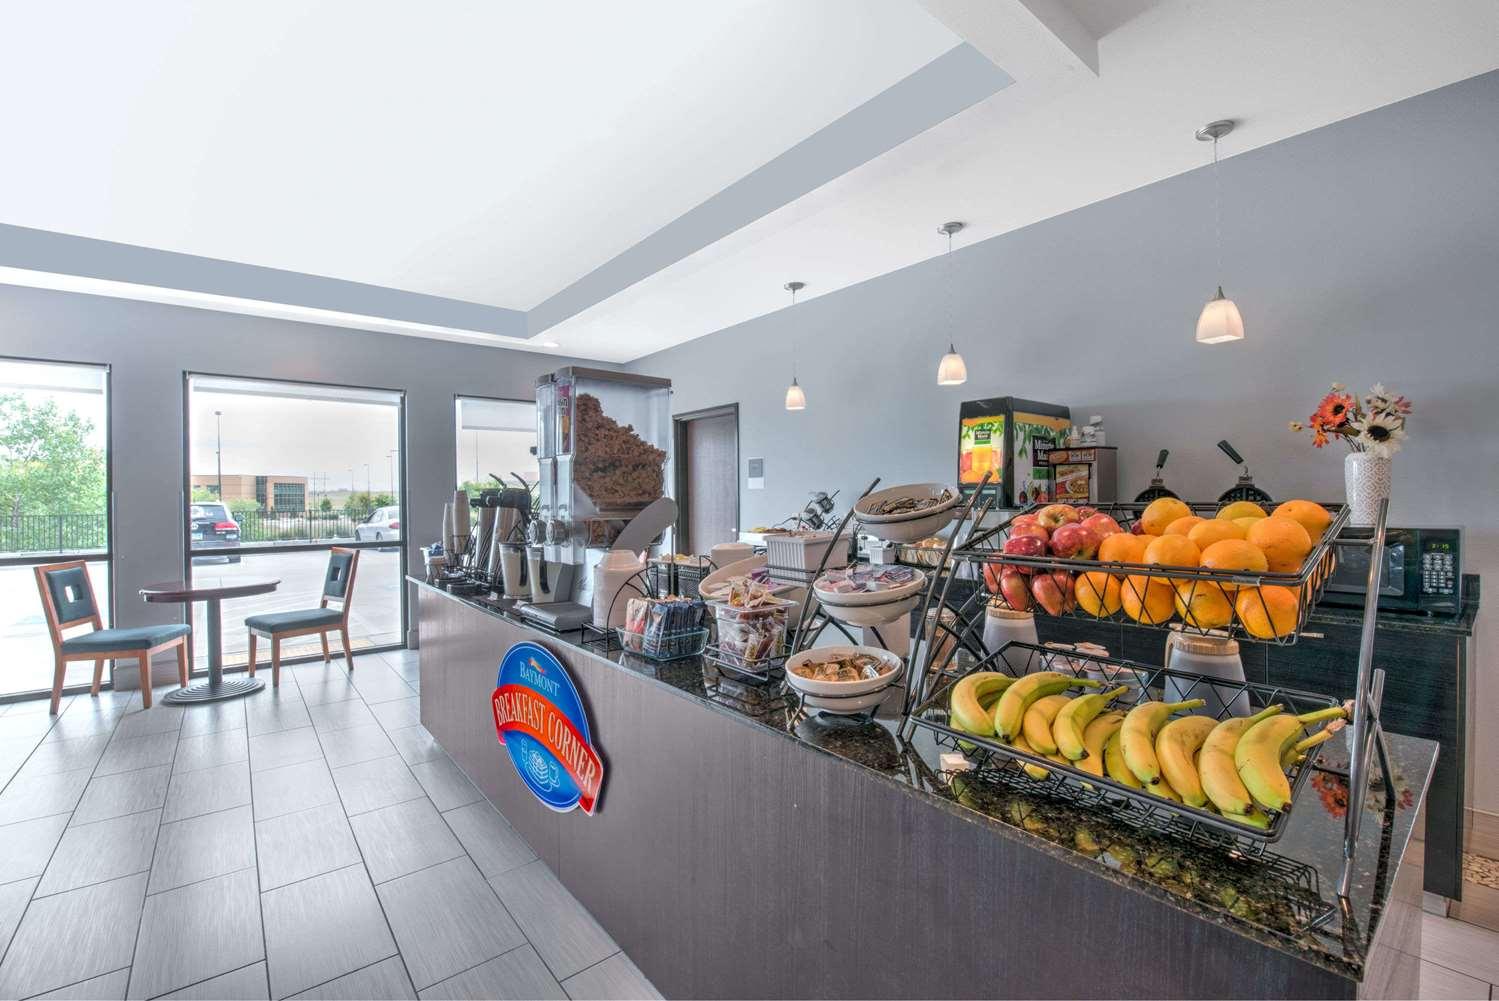 proam - Baymont Inn & Suites Rapid City